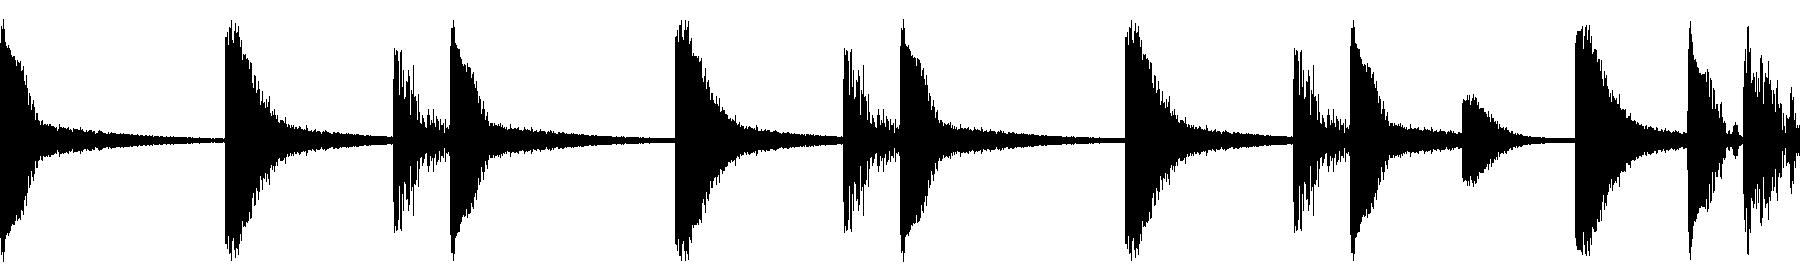 cymatics x san holo   full drum loop 5   160 bpm